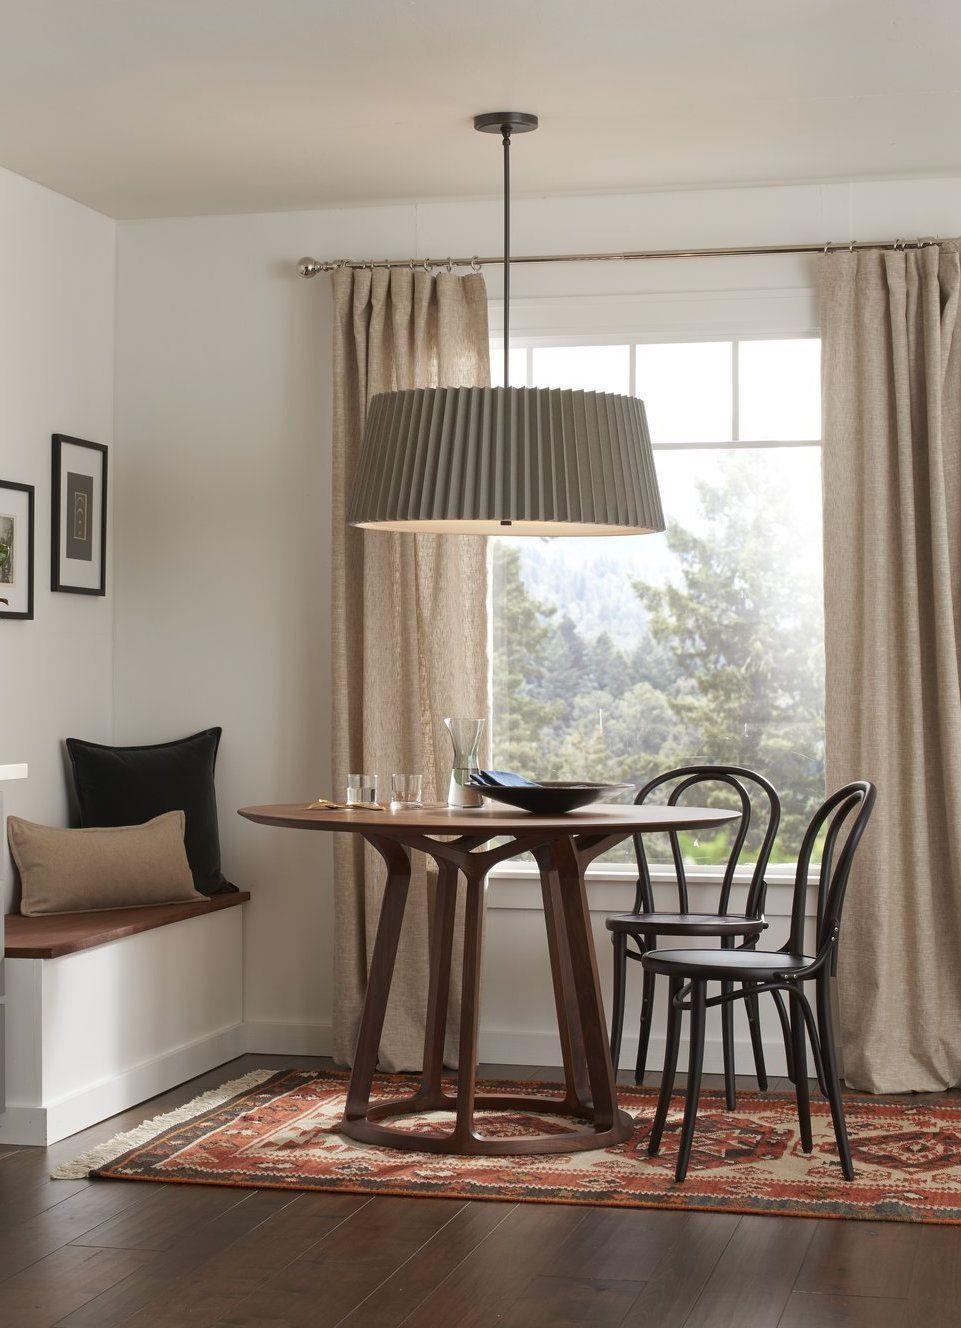 Dining Room Lighting. Pleated Light Shade. Vintage Inspired Lighting. Gray Light  Shade. Dining Room.